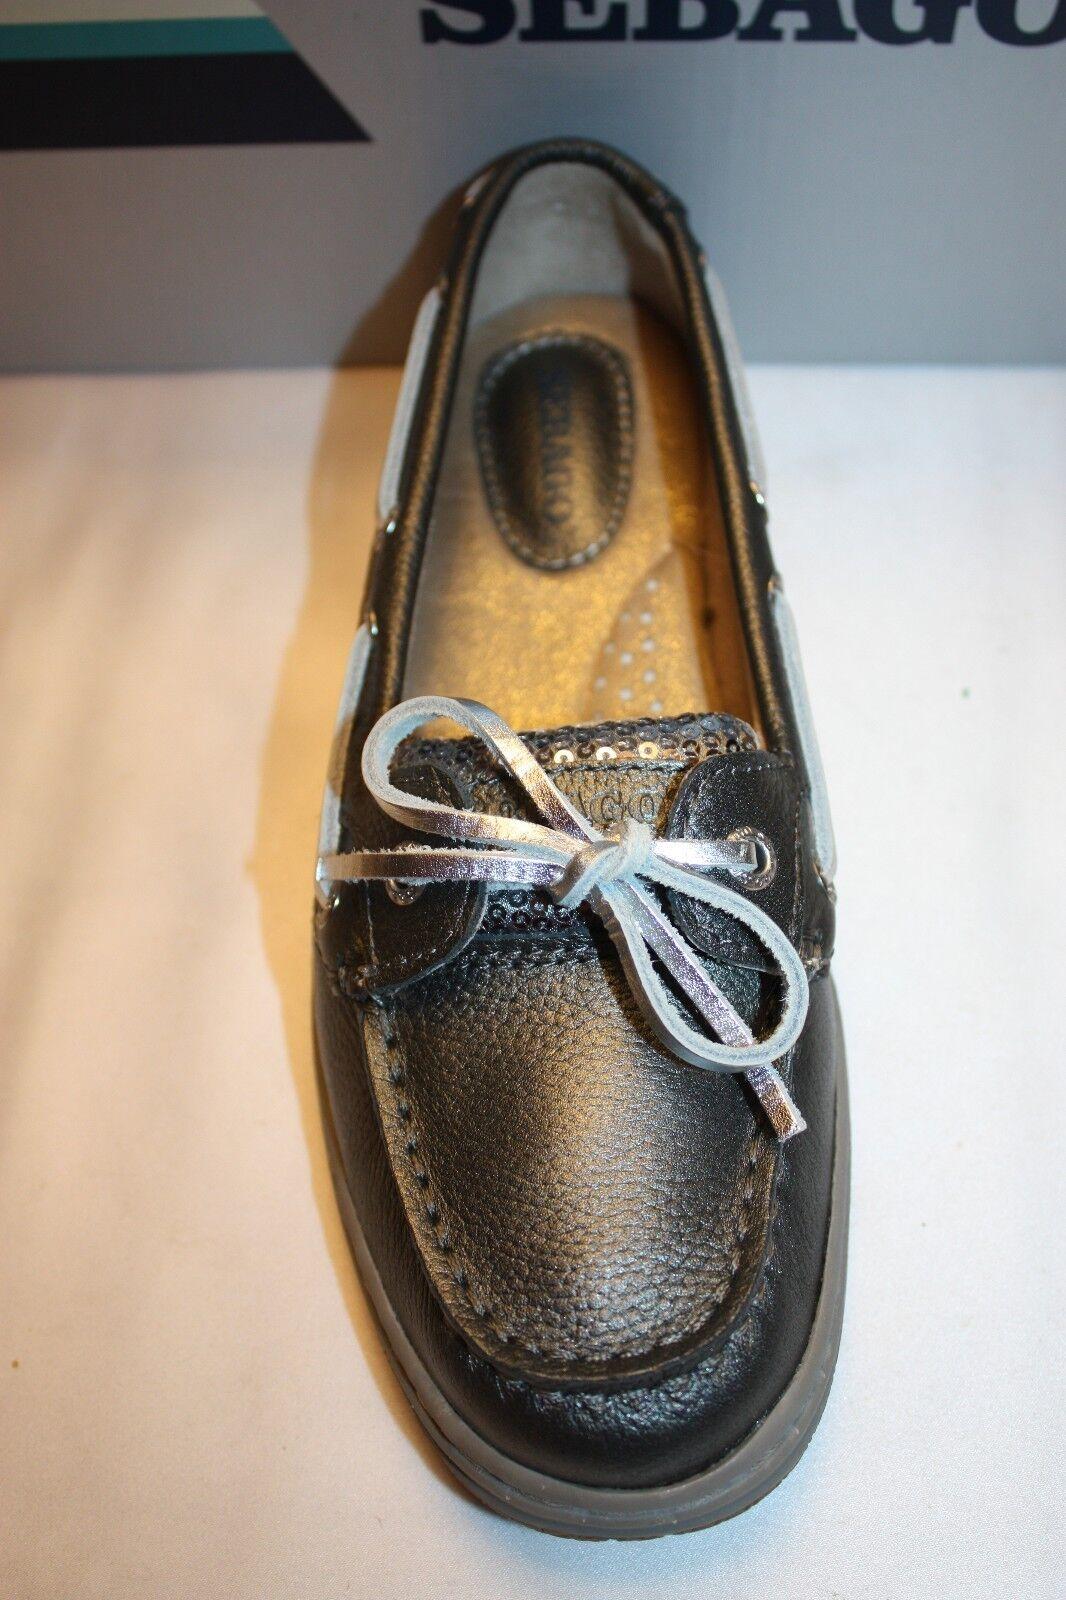 NEW  NIB  Pewter SEBAGO Metallic Pewter  Leder SKIMMER Sequin Boat Schuhes Slip Ons f45984